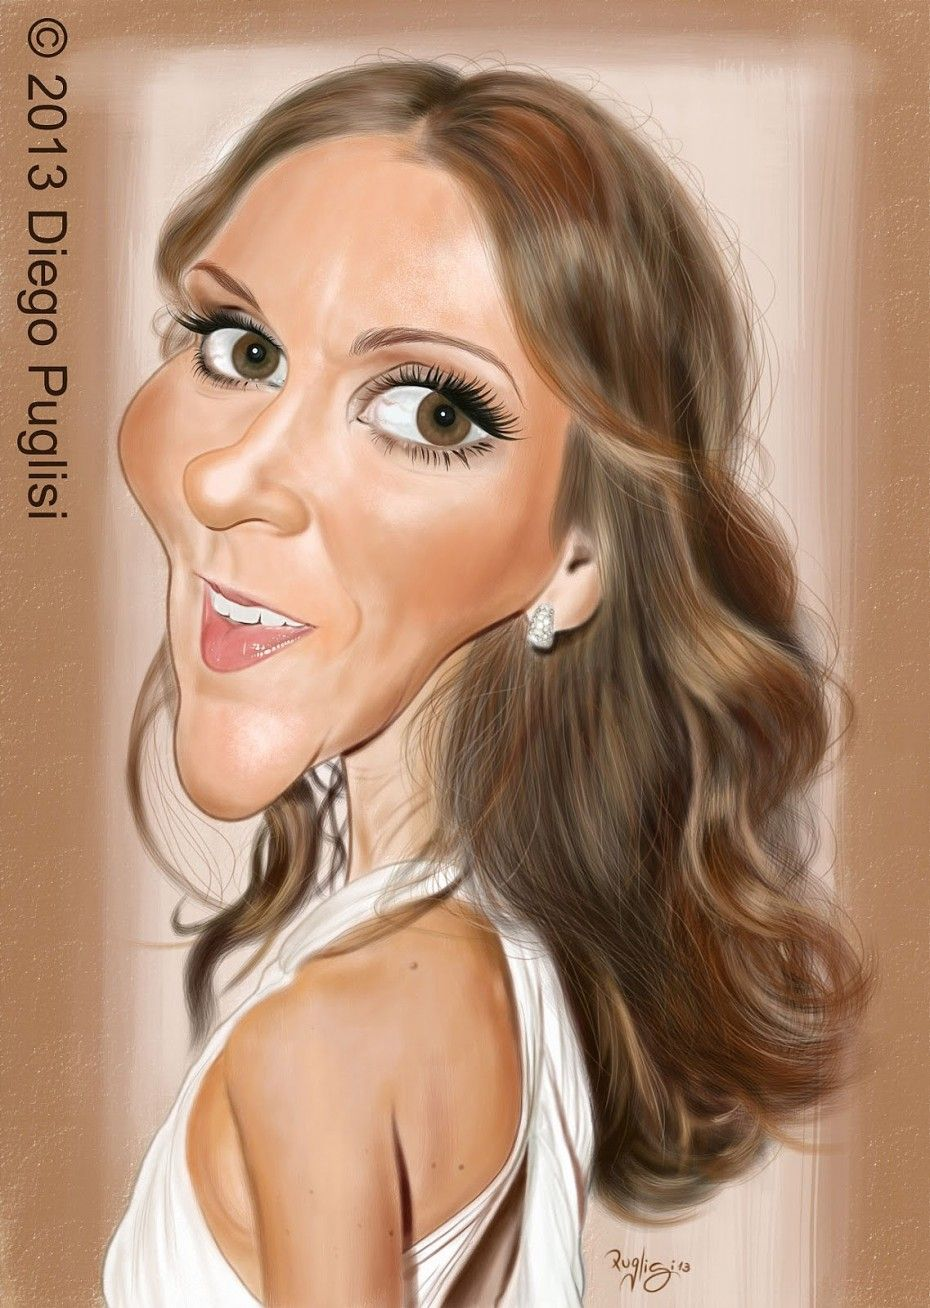 Caricatura De Celine Dion Celebrity Caricatures Funny Pictures Of Women Celebrity Art